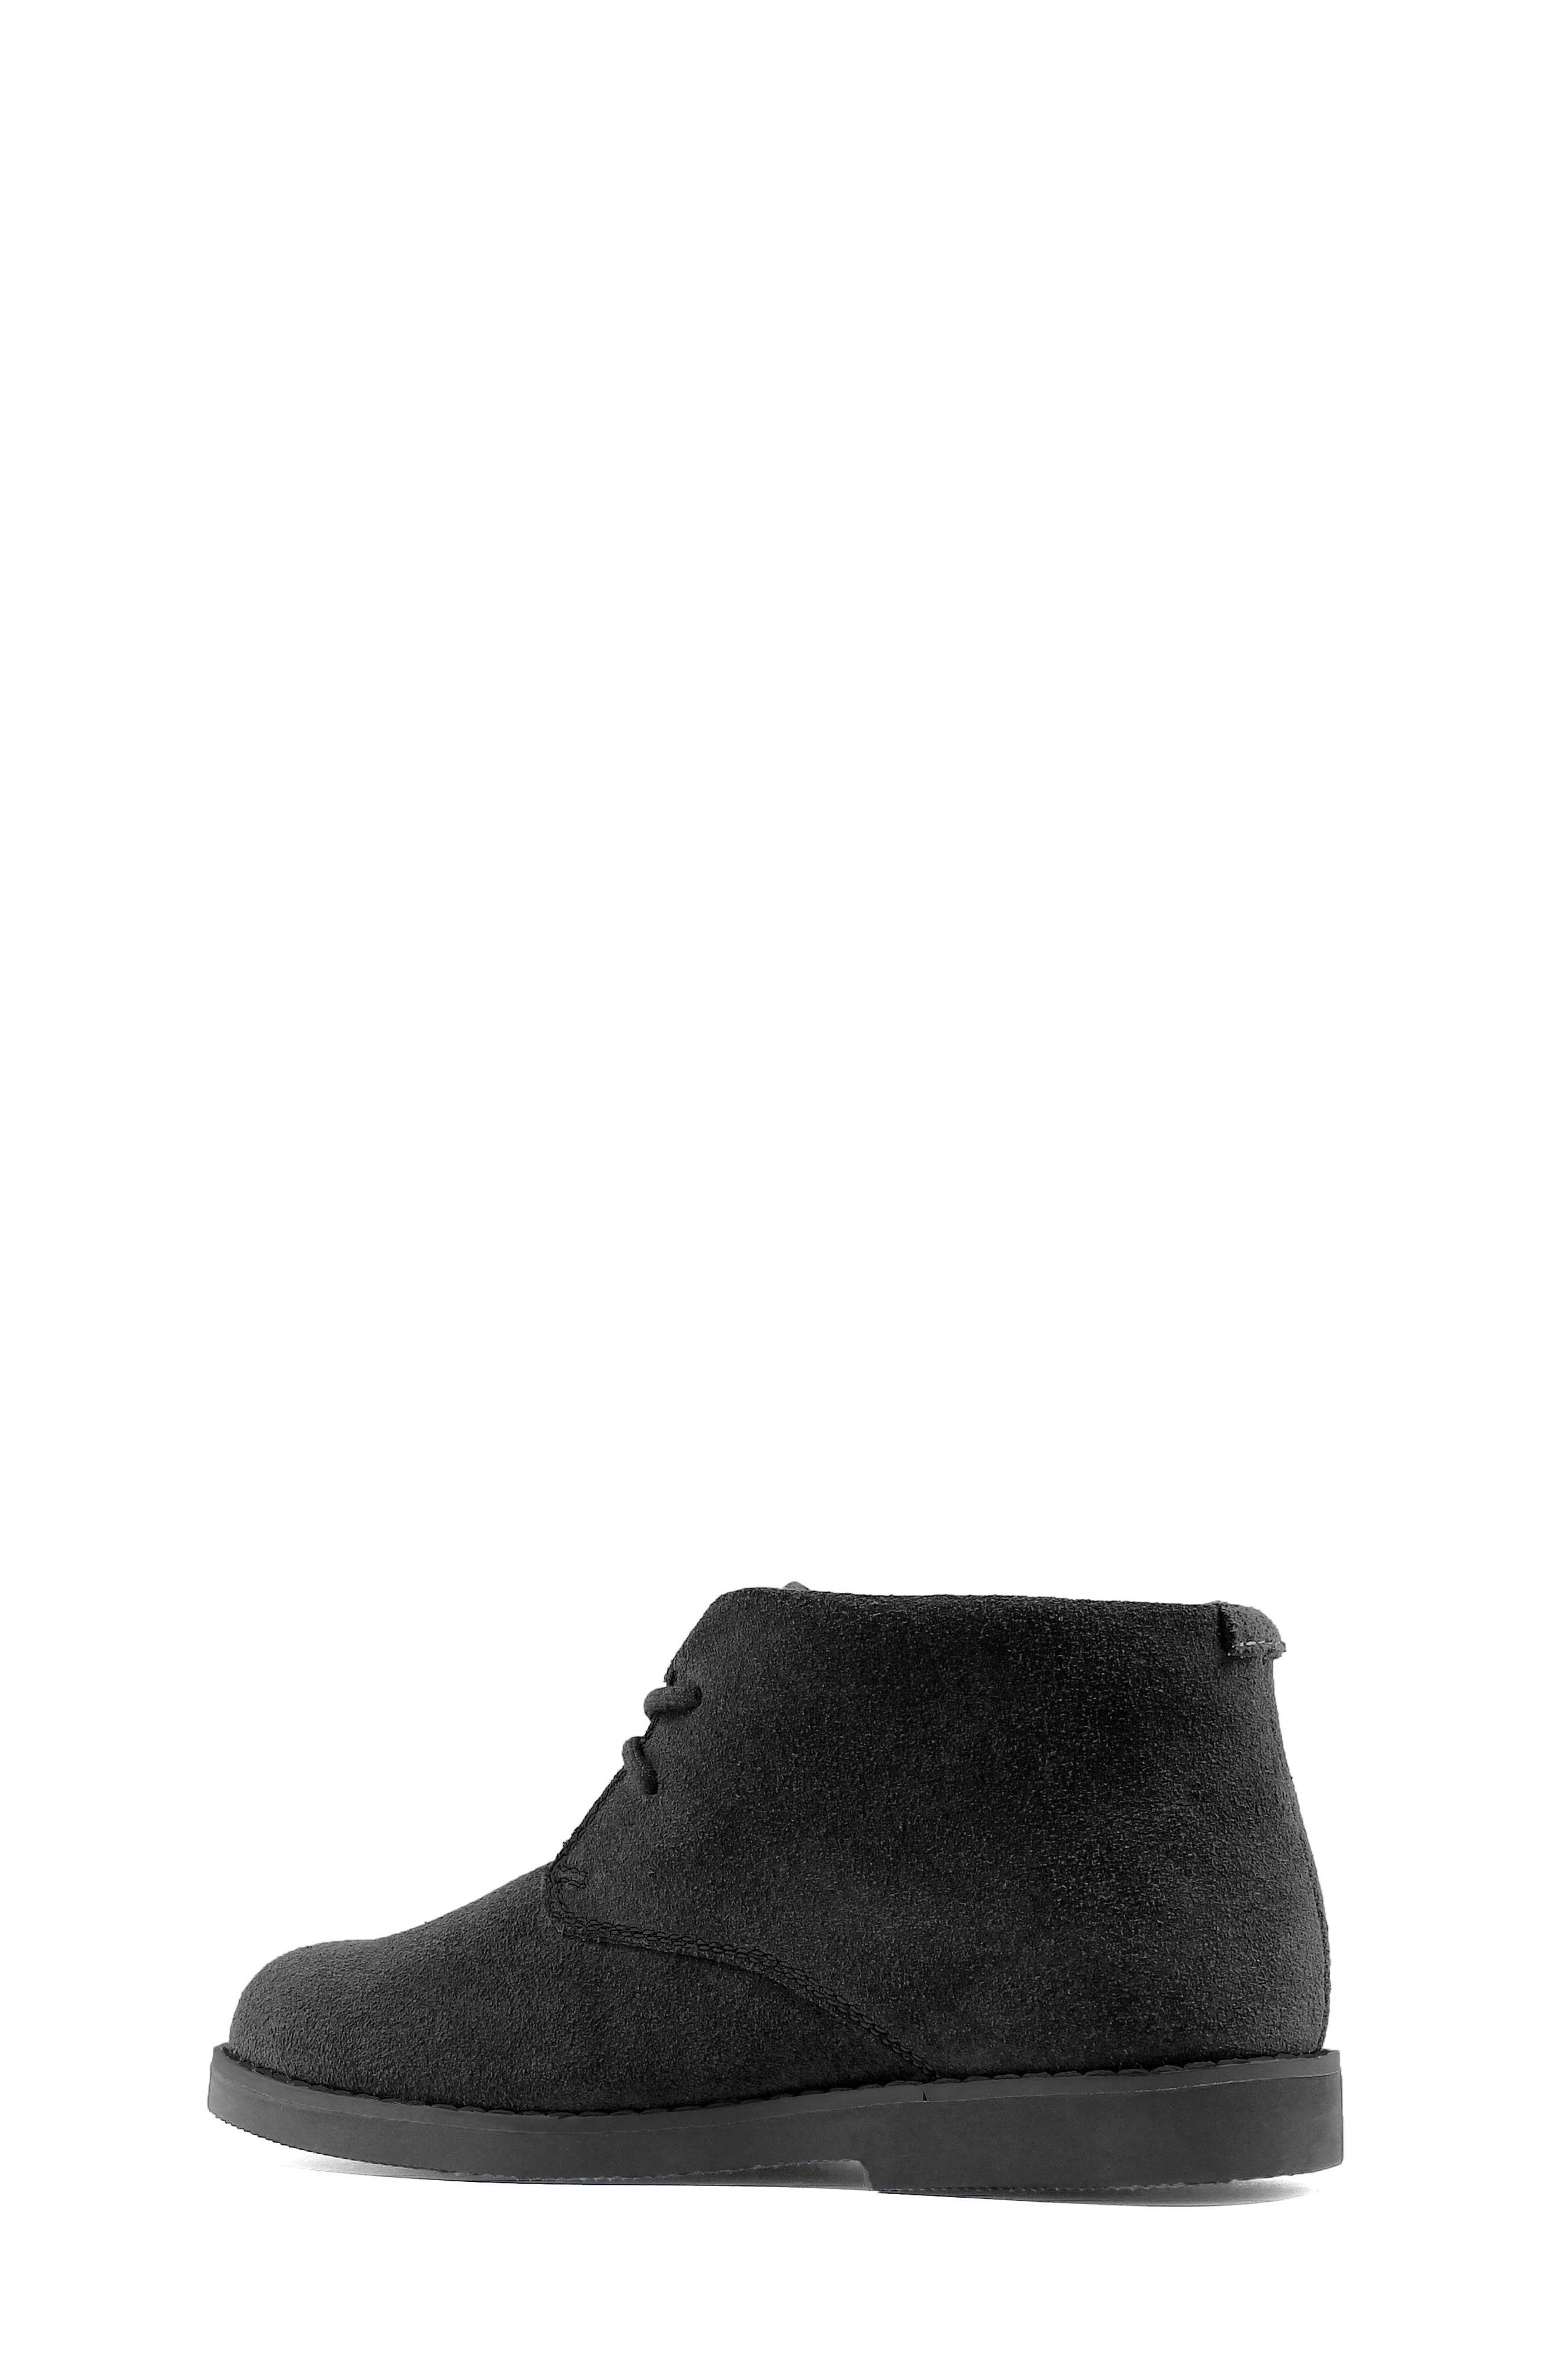 'Quinlan' Chukka Boot,                             Alternate thumbnail 3, color,                             001